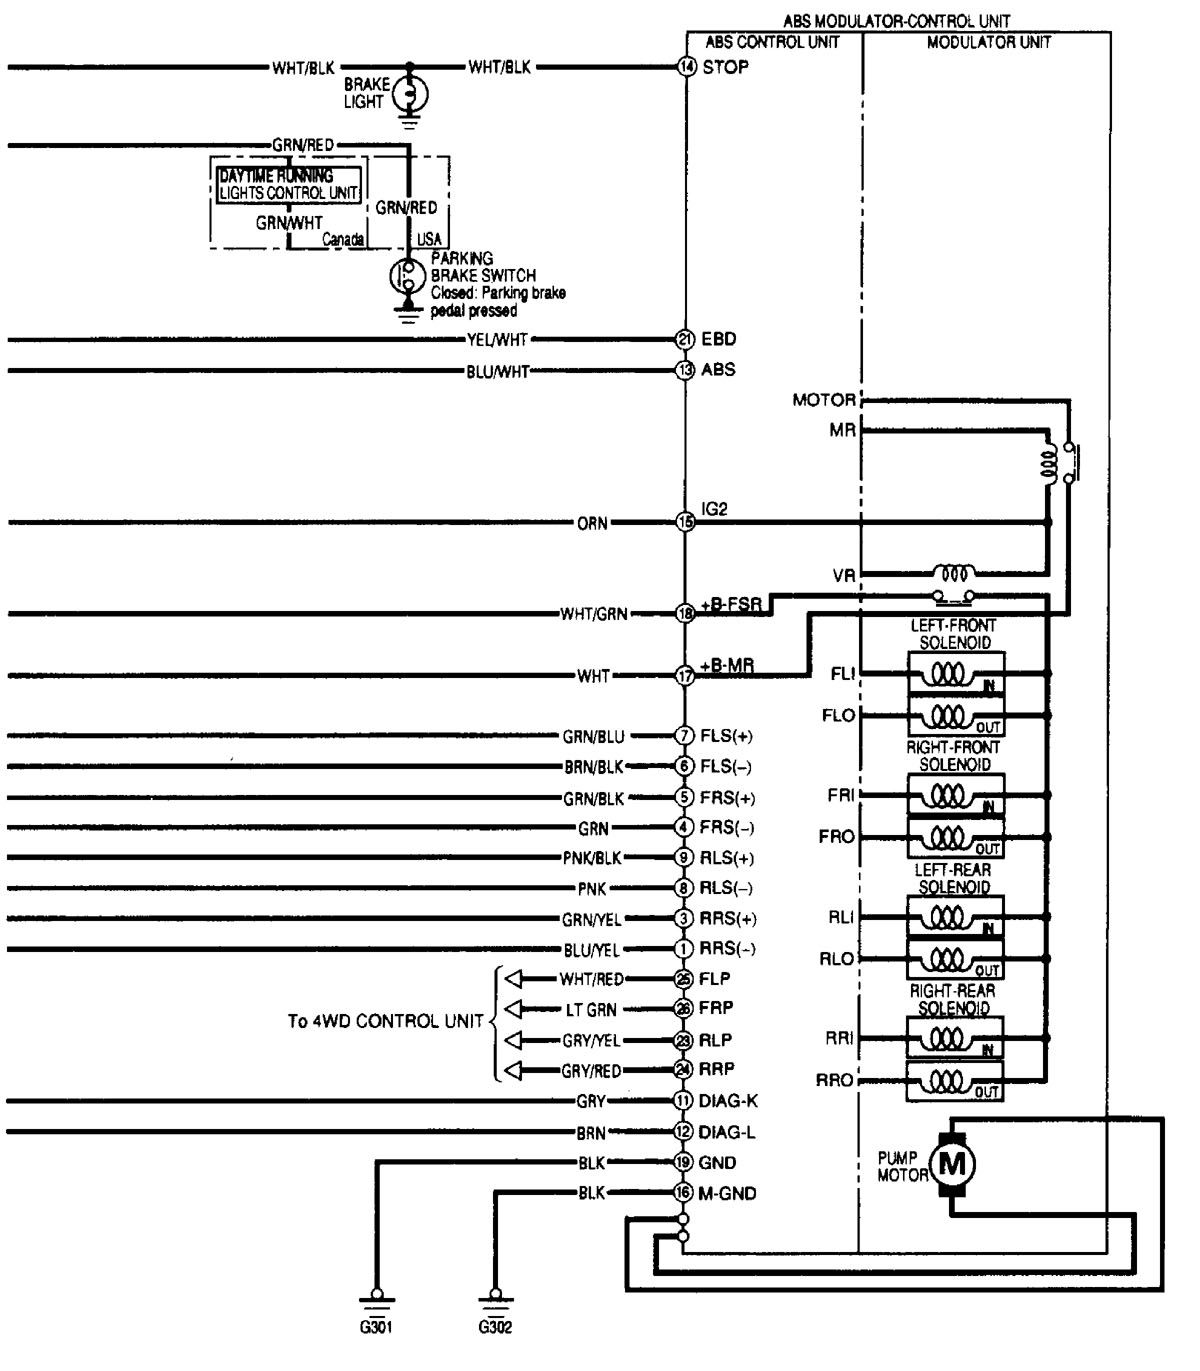 hight resolution of acura mdx 2001 wiring diagrams brake controls acura mdx fuse box diagram